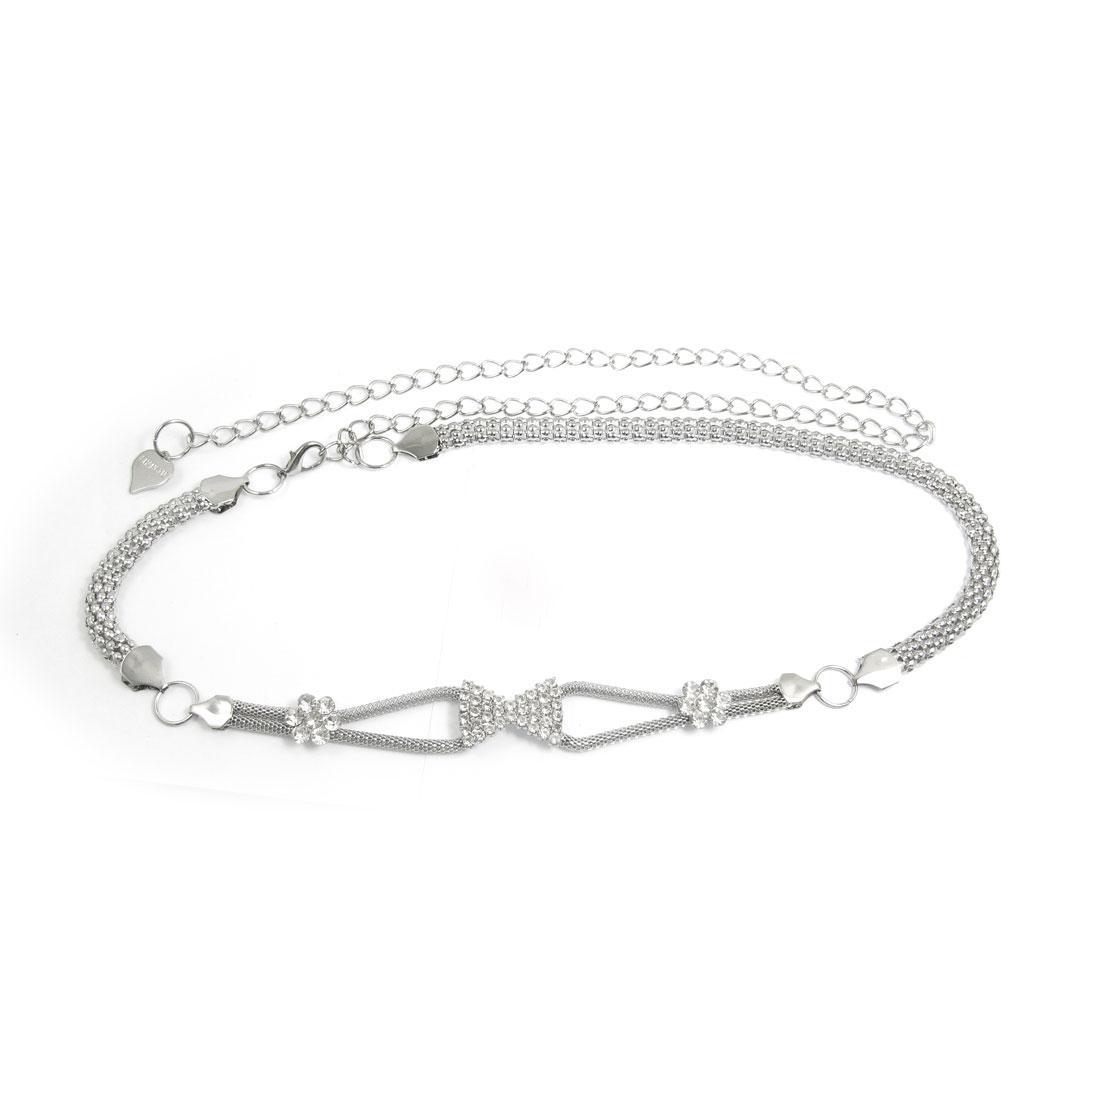 Lady-Clear-Faux-Rhinestone-Decor-Gold-Tone-Metal-Bowknot-Pattern-Belt-Chain